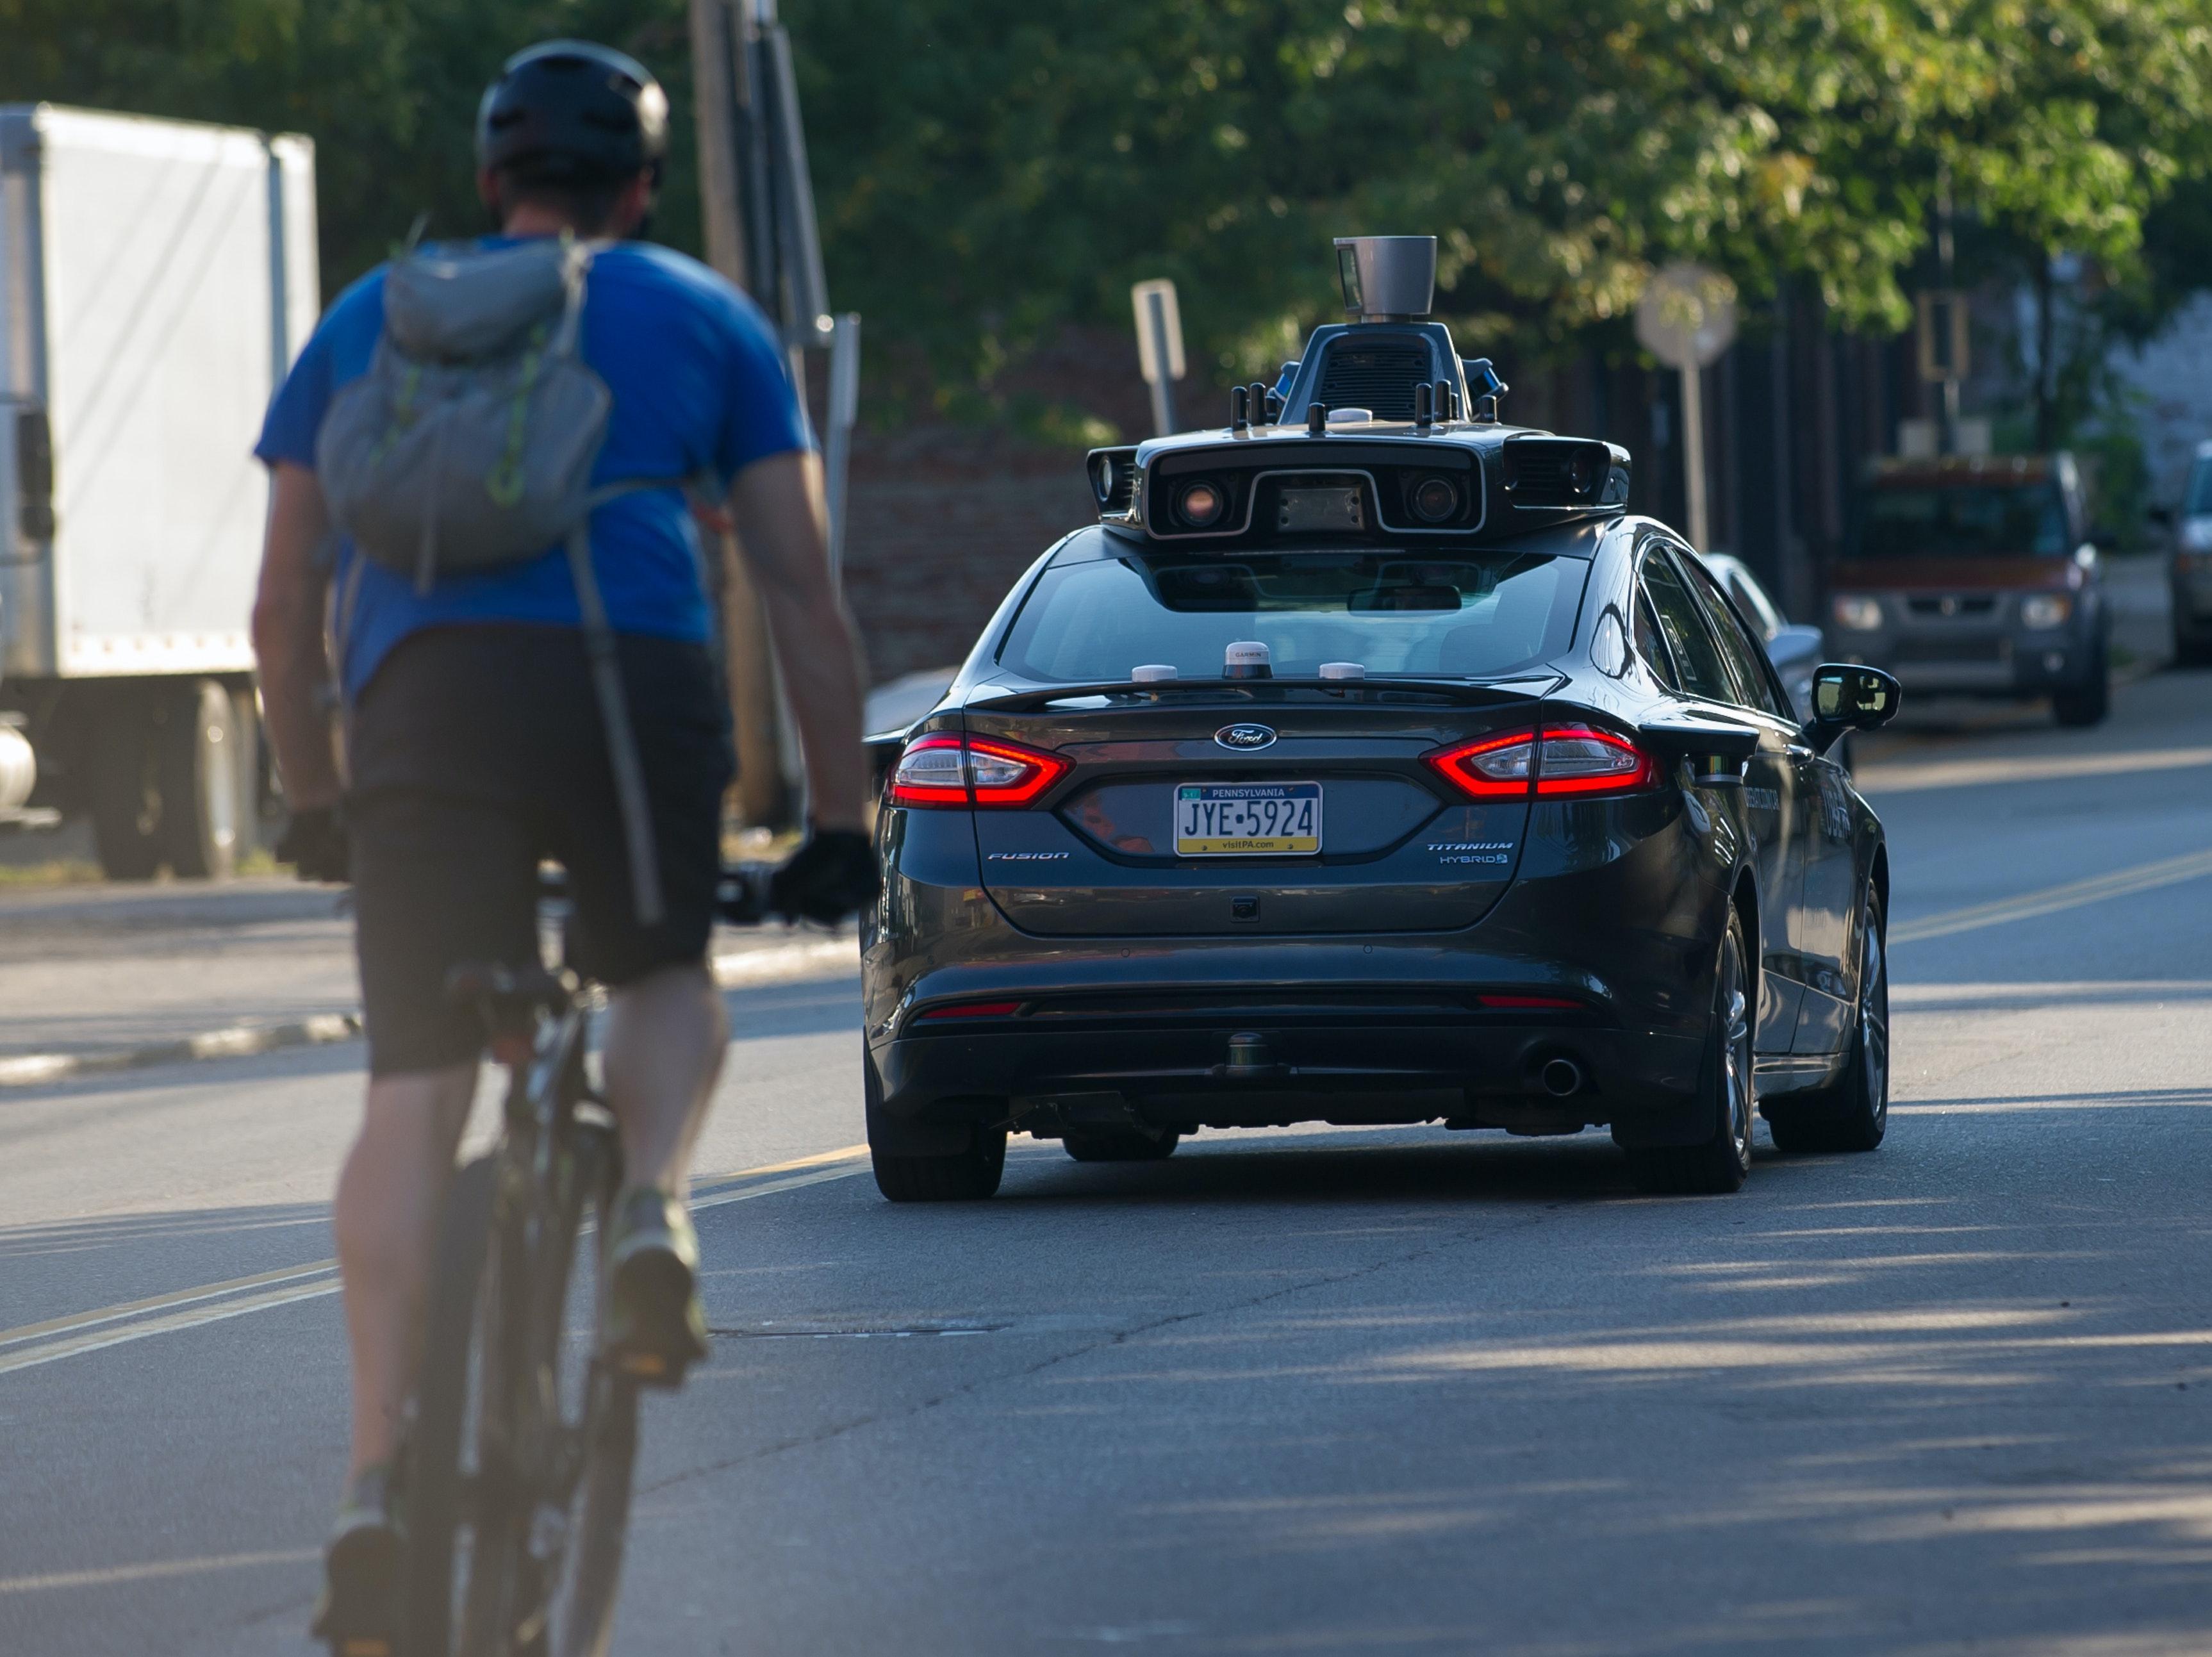 Autonomous Vehicles May Incite Reckless Human Driving